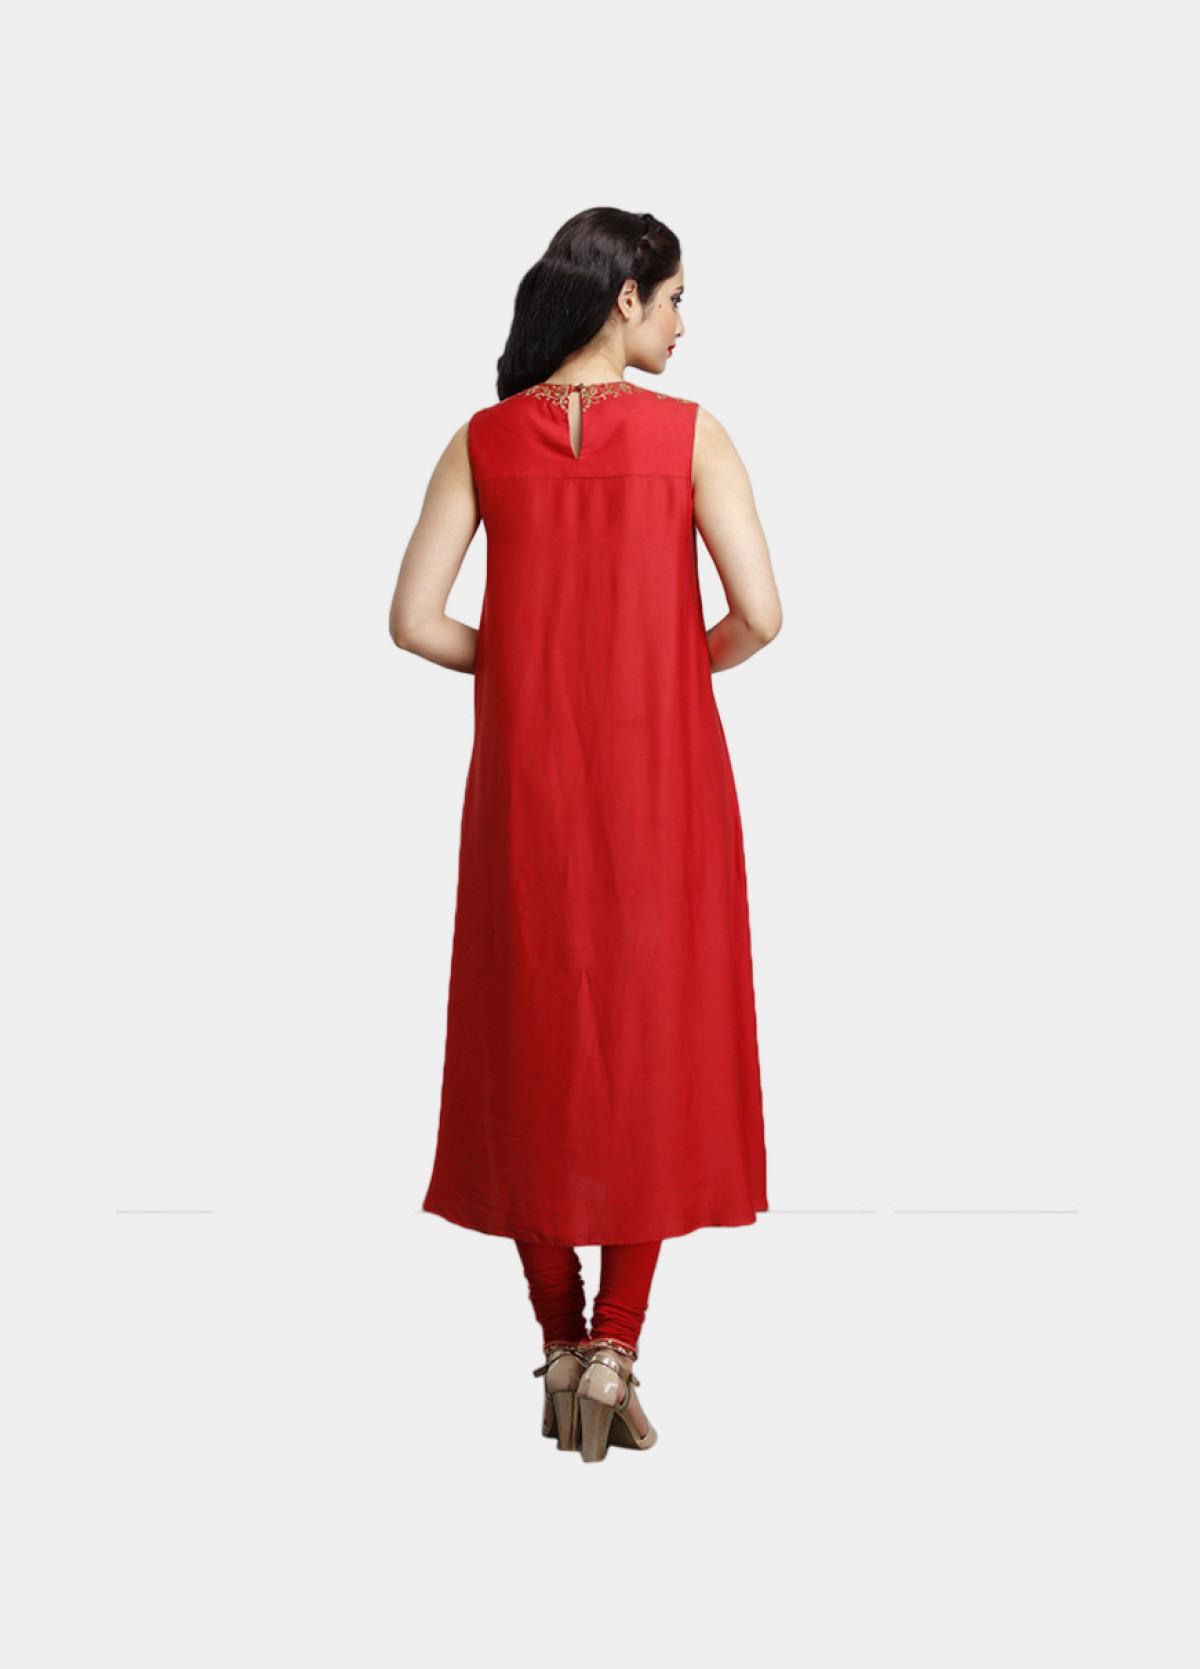 The Red Modal Kurta Bottom Dupatta Set